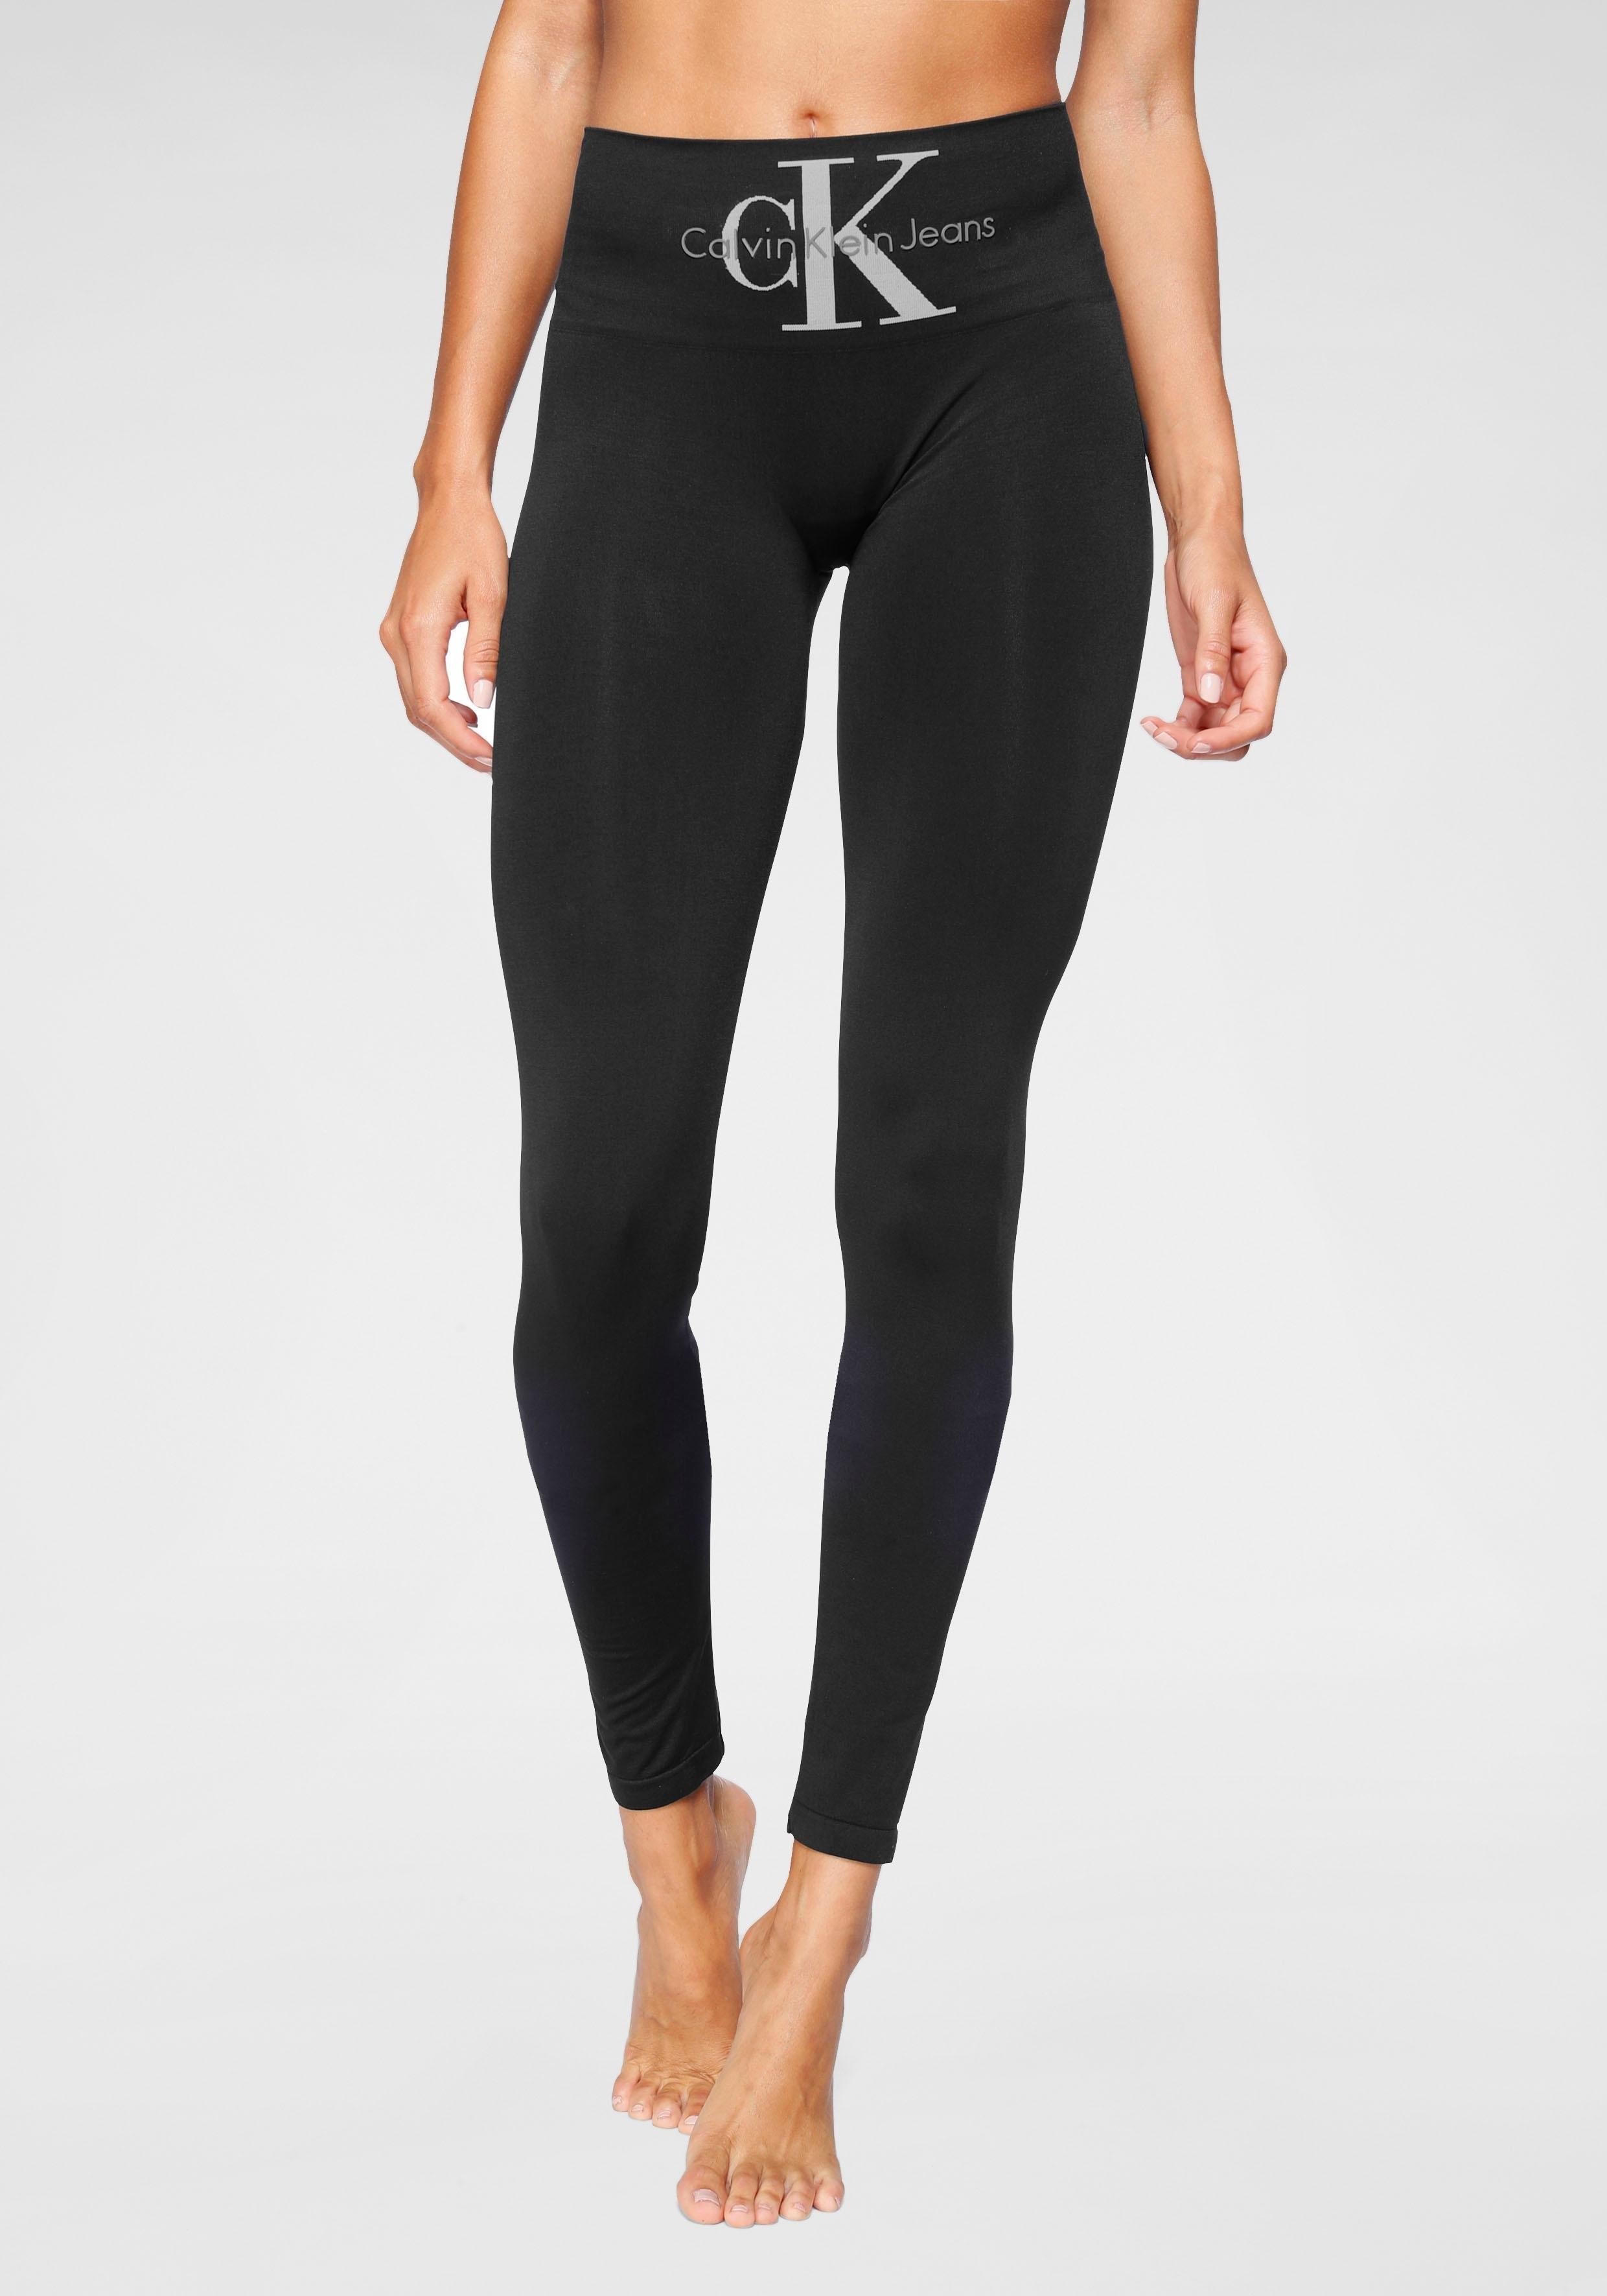 Calvin Klein legging met brede modellerende band bij Lascana online kopen